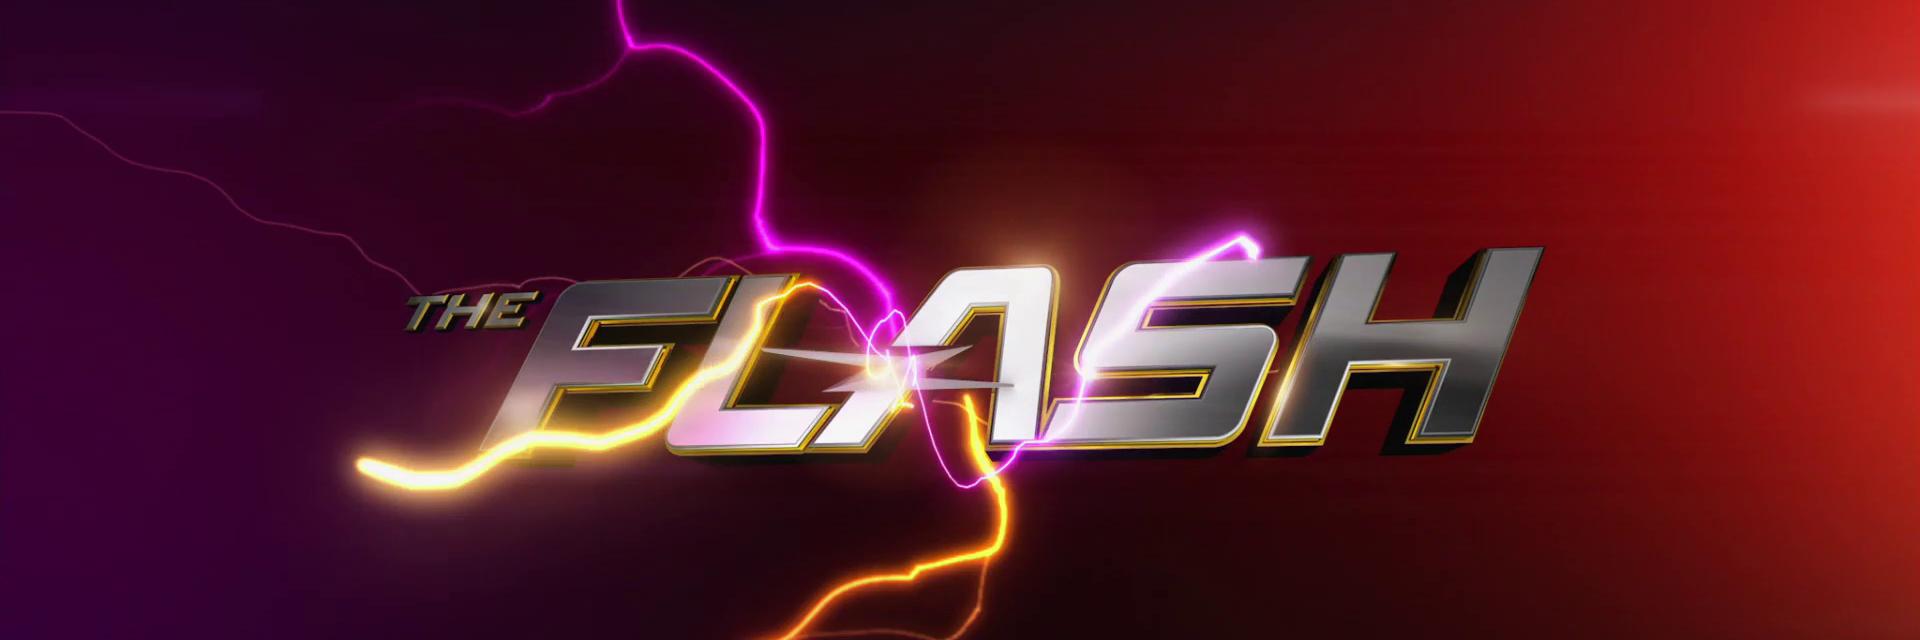 Kneel Before Blog - The Flash -